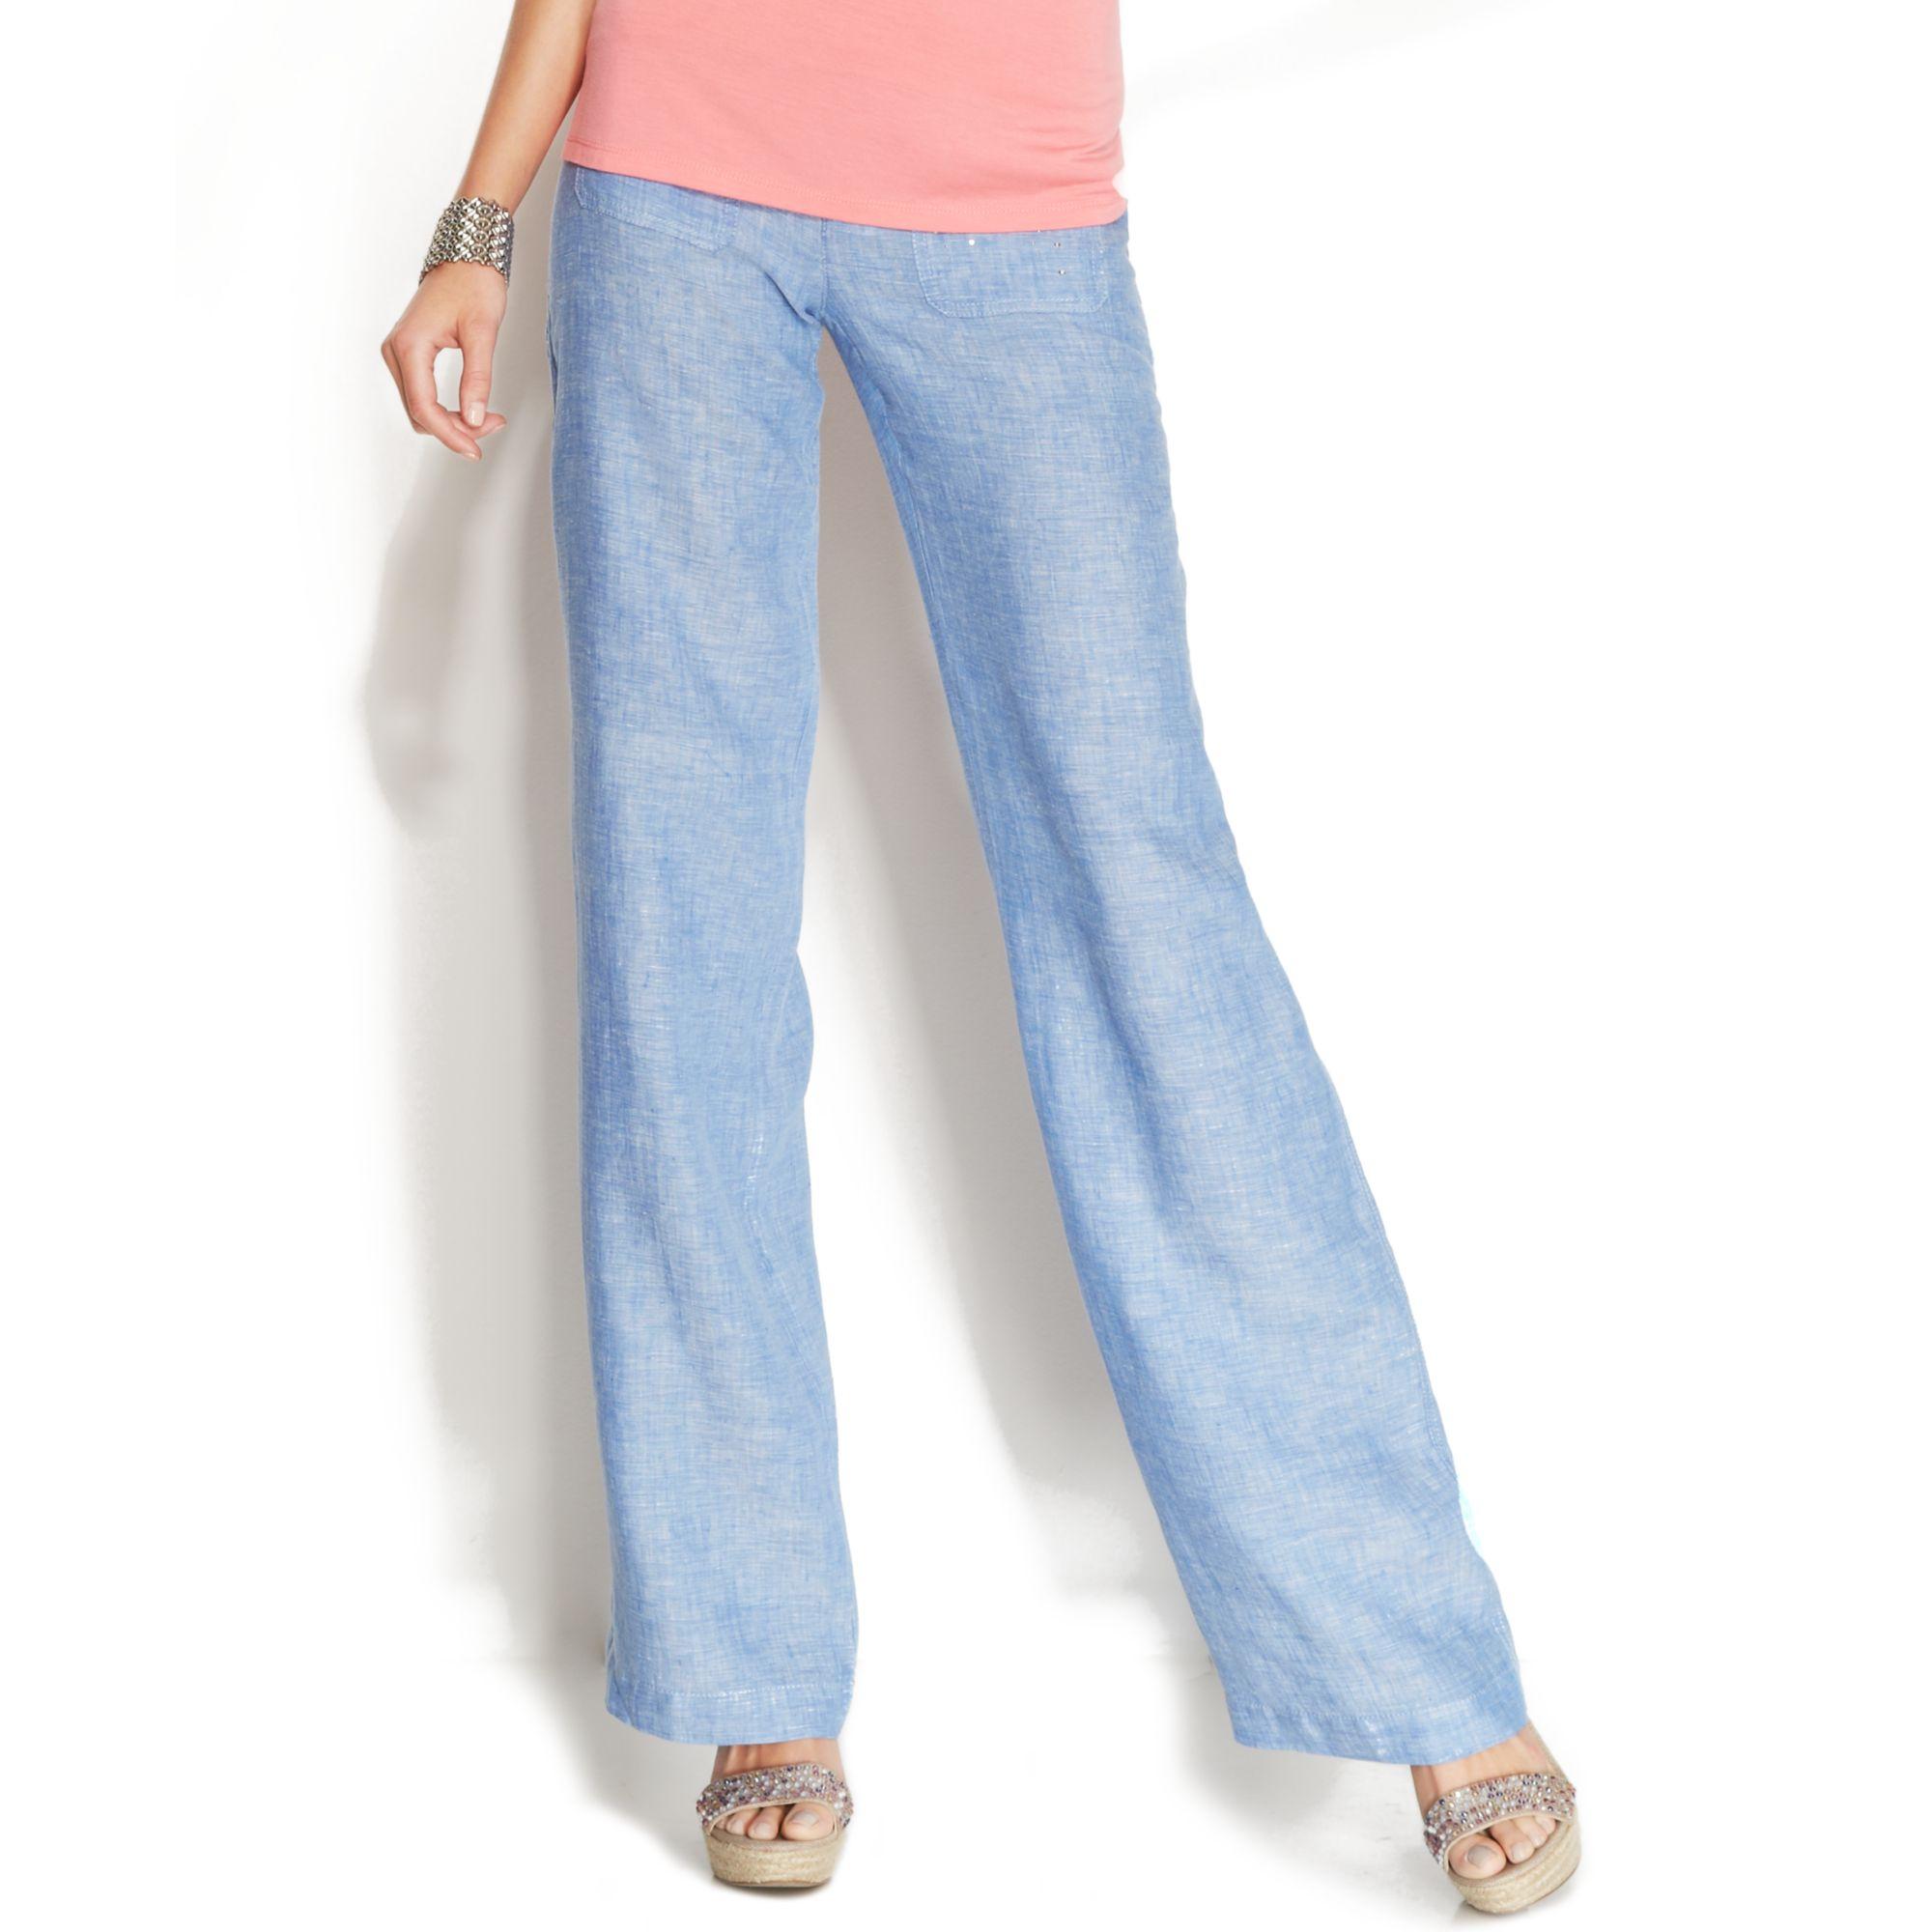 Inc international concepts Petite Embellished Wideleg Linen Pants ...